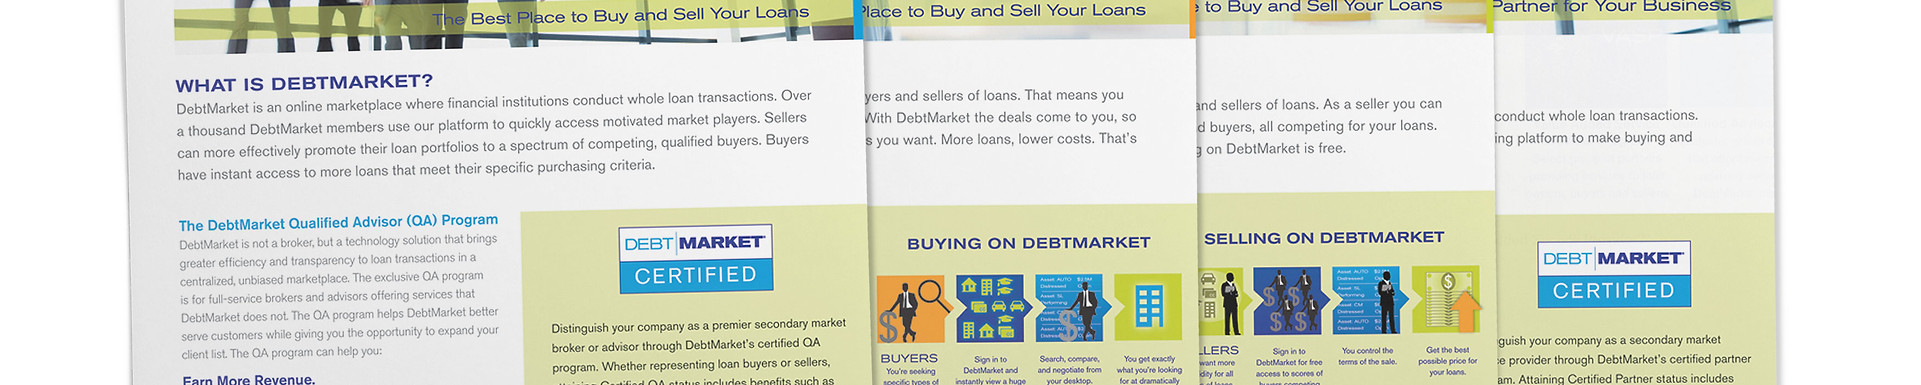 DebtMarket